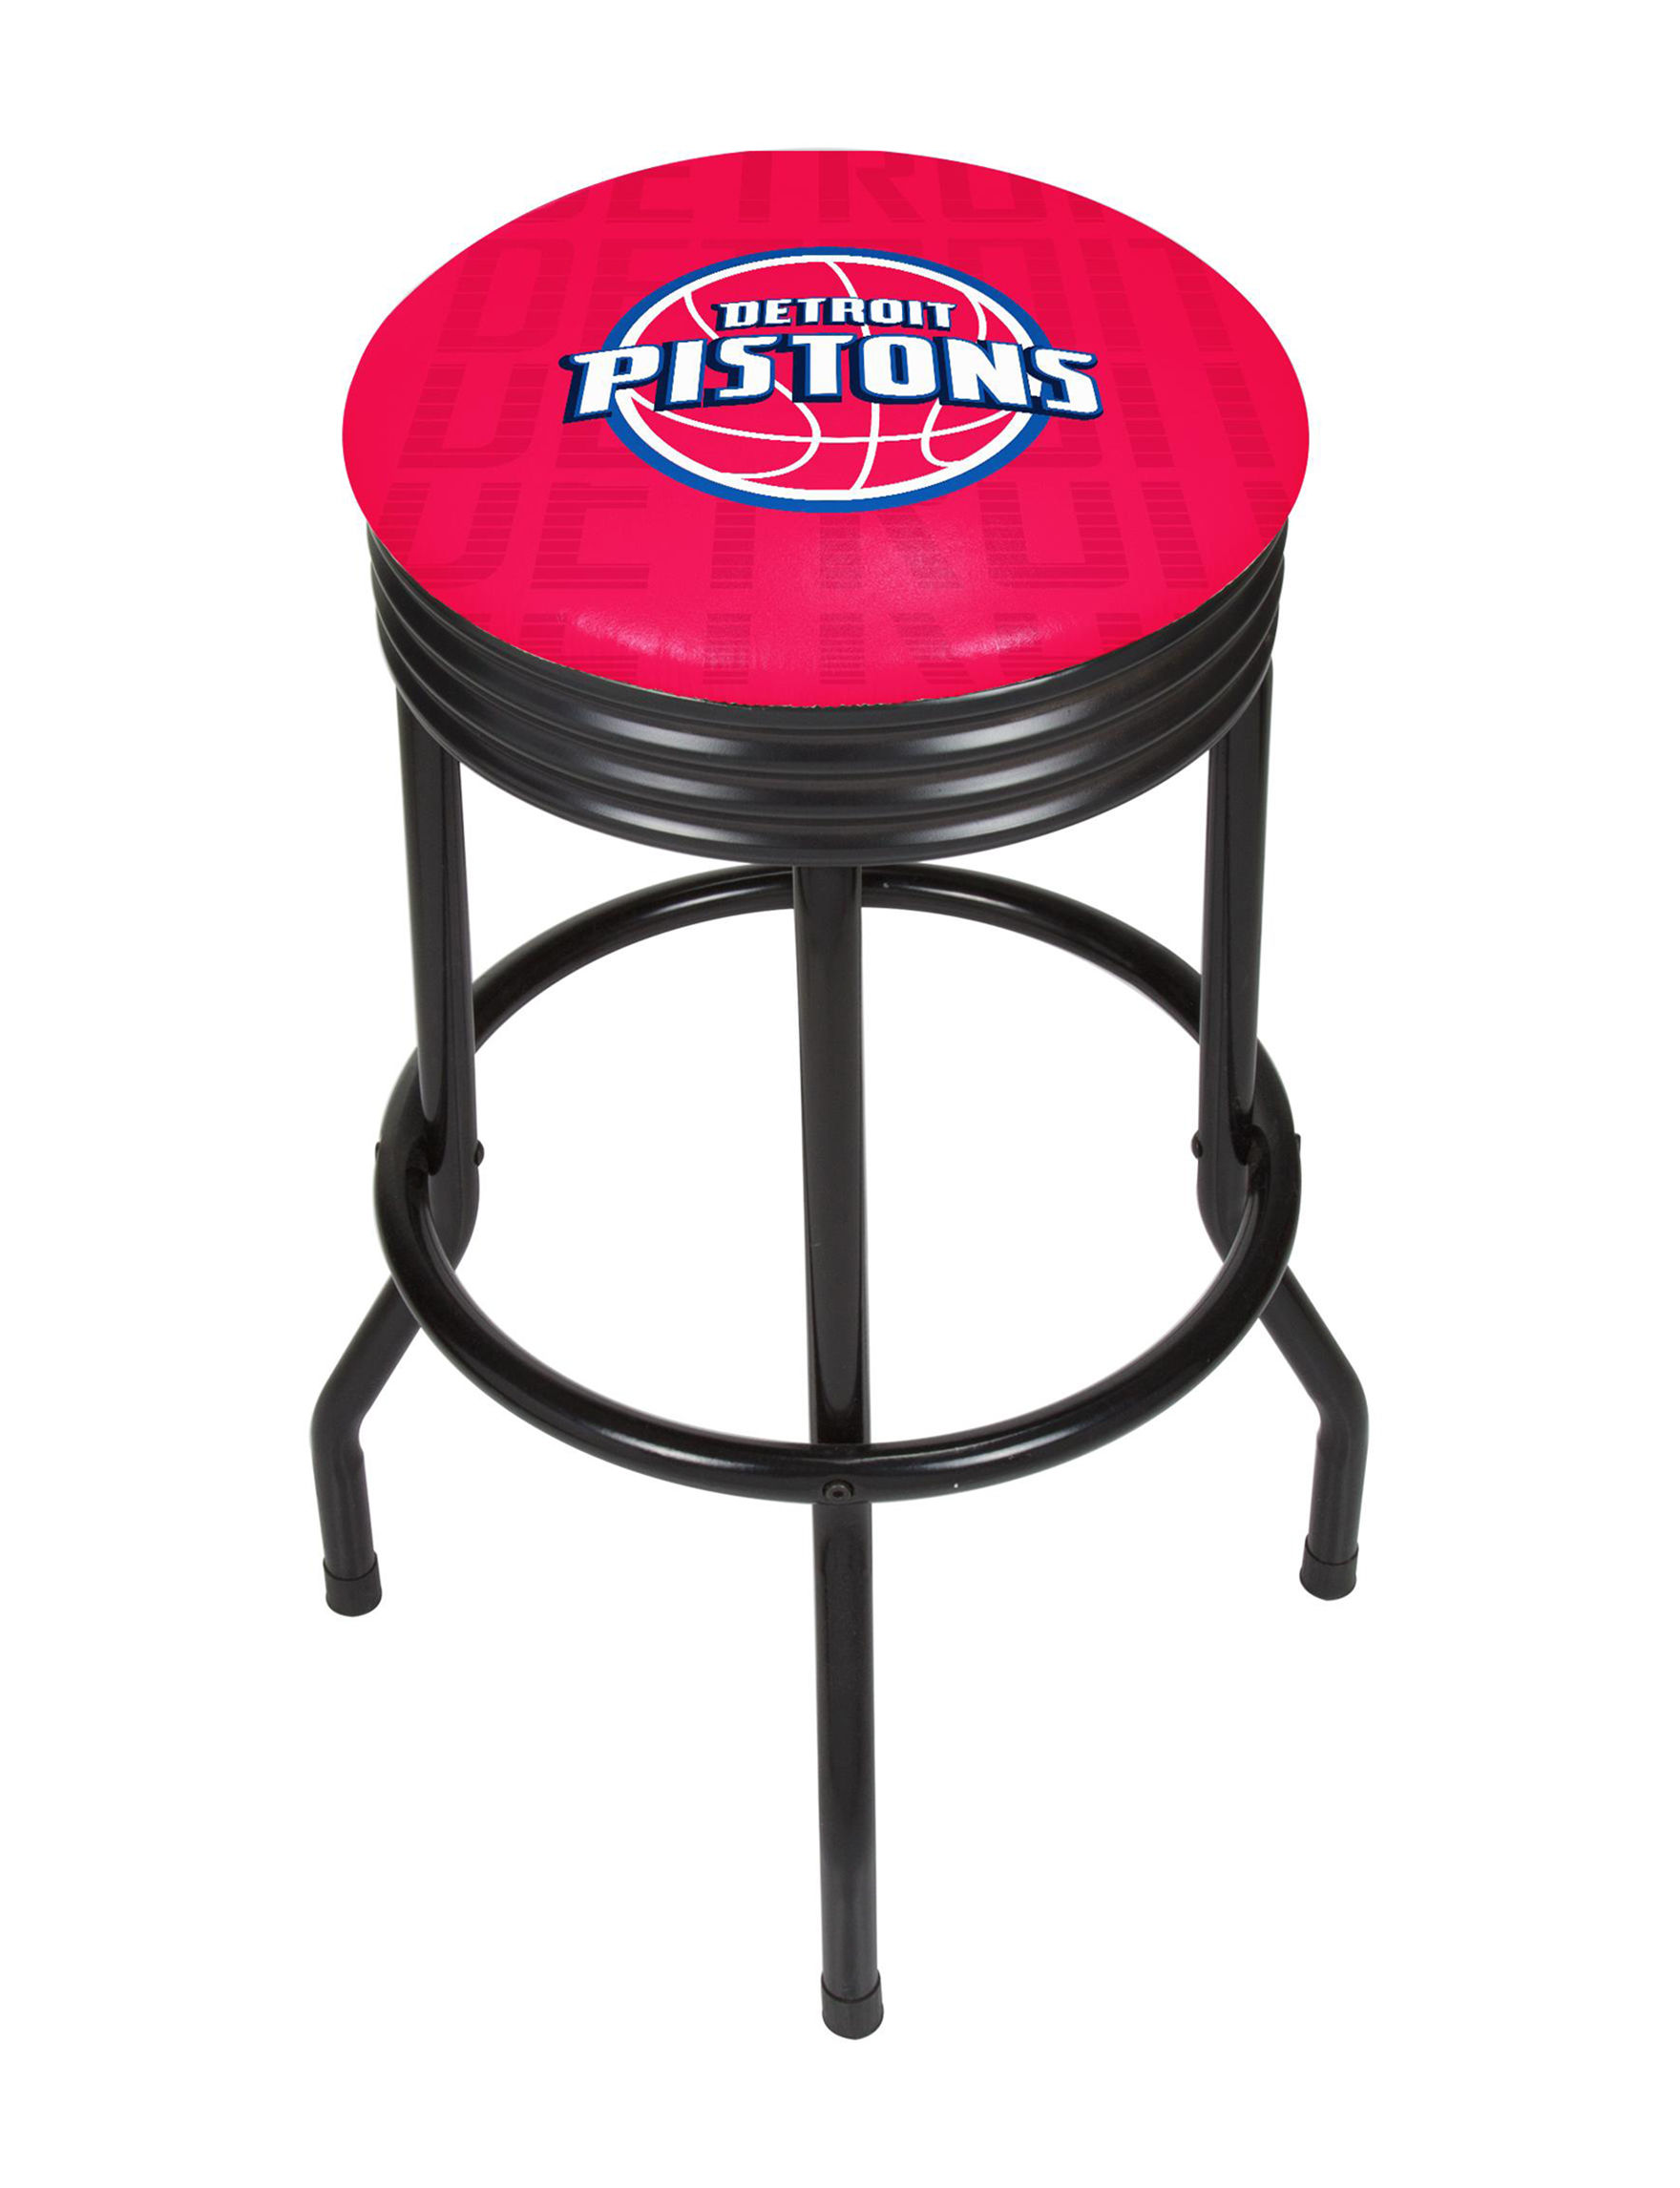 NBA Red / White / Blue Bar & Kitchen Stools Kitchen & Dining Furniture NBA